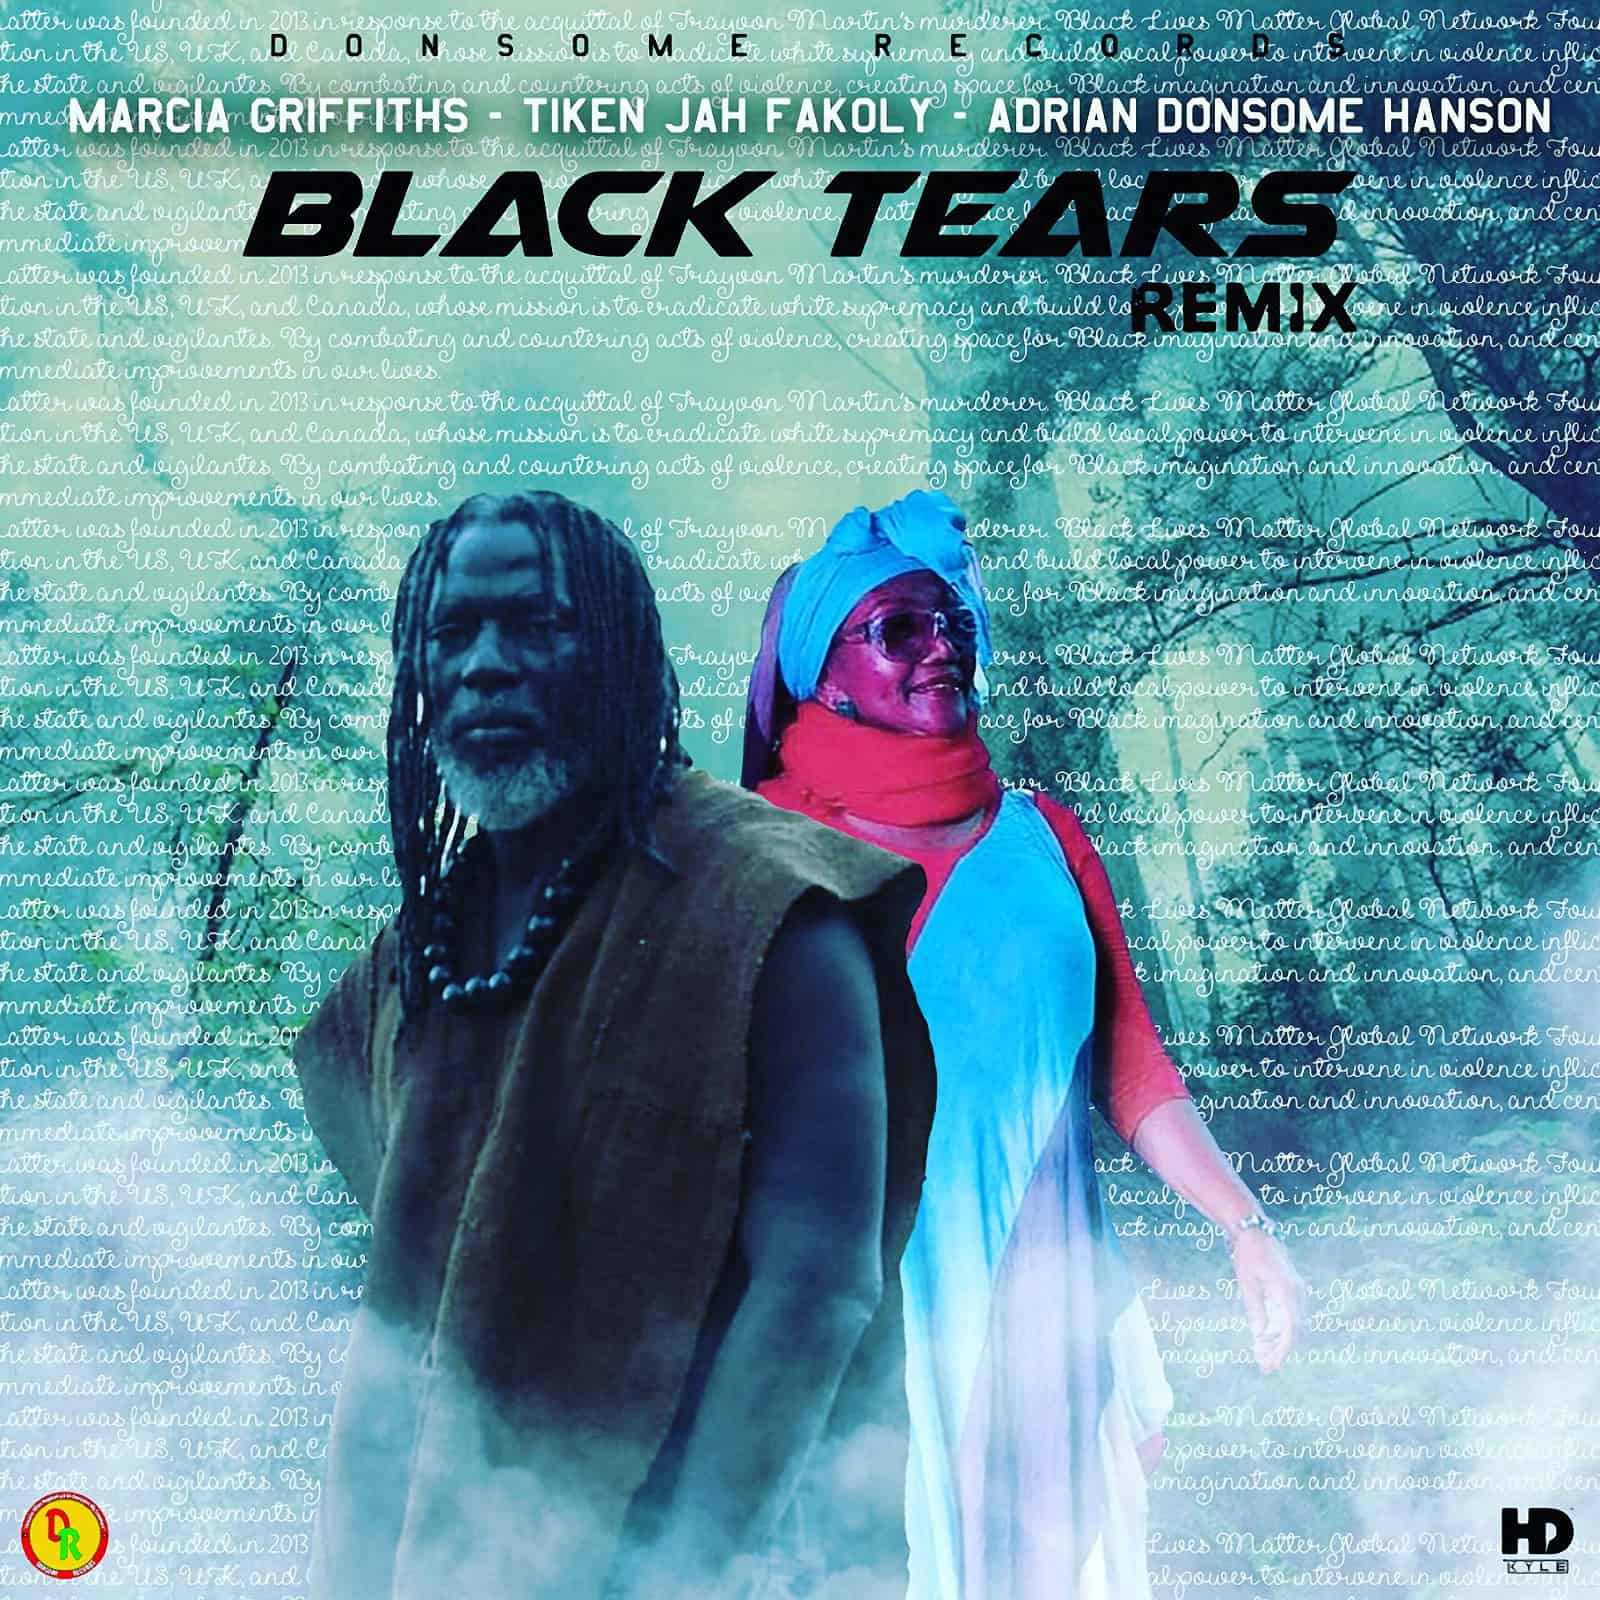 Marcia Griffiths & Tiken Jah Fakoly - Black Tears Remix - Donsome Records